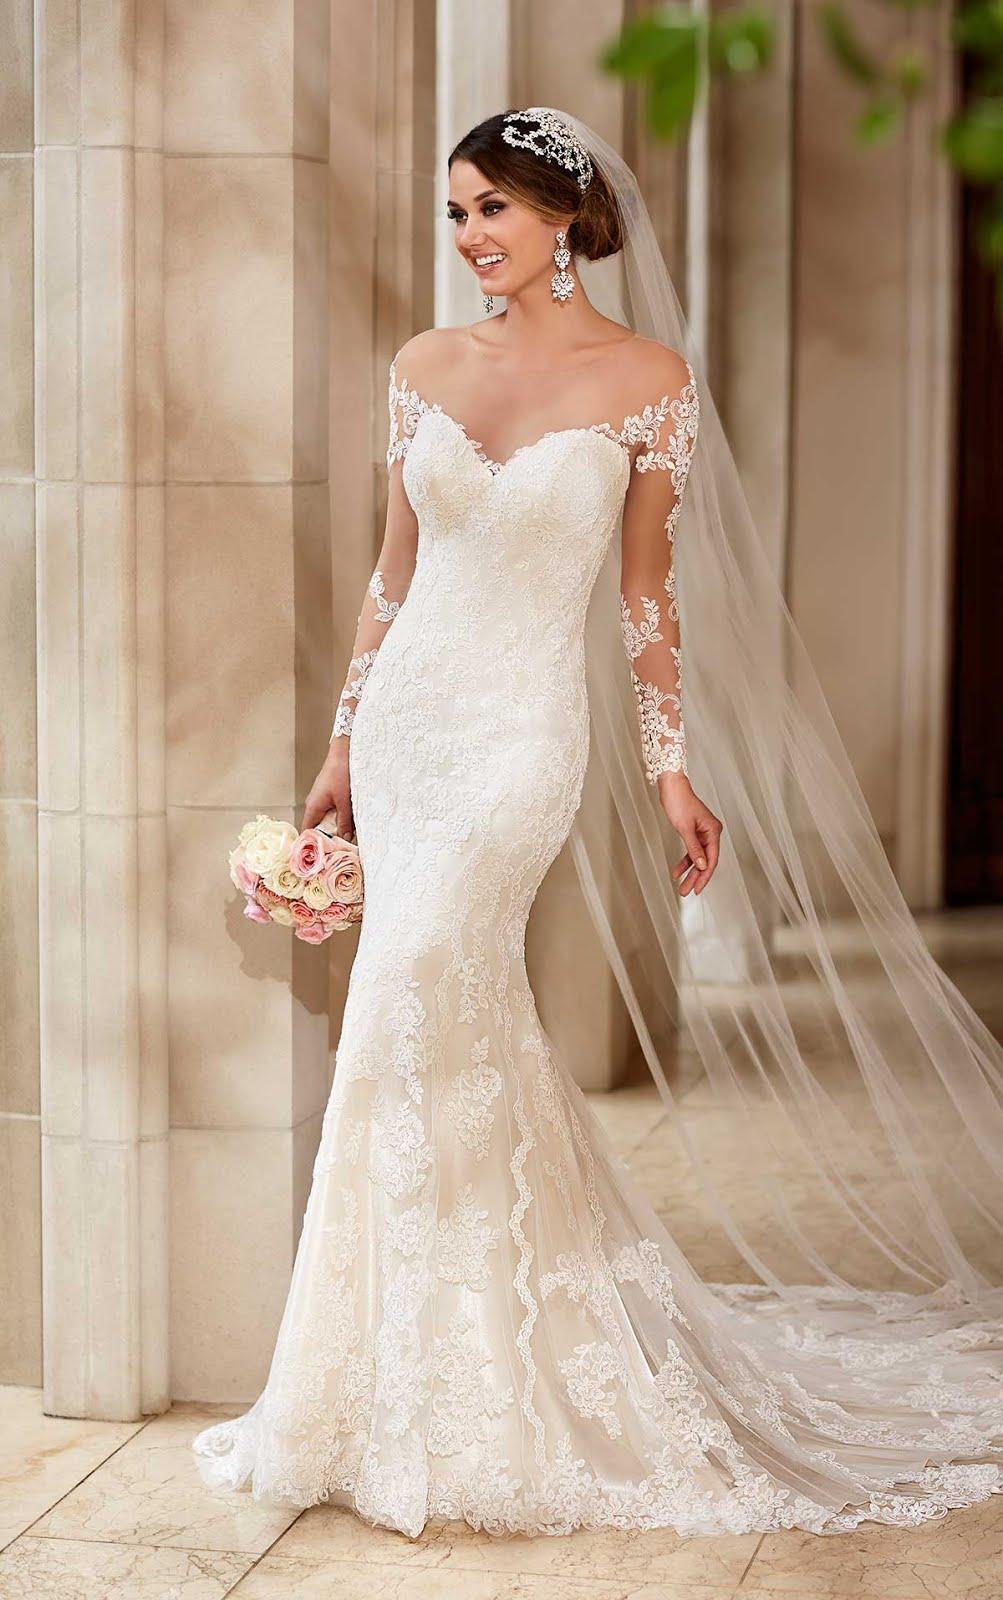 Brautstudio Edelweiss. Brautmoden, Abendmoden und Bräutigammoden